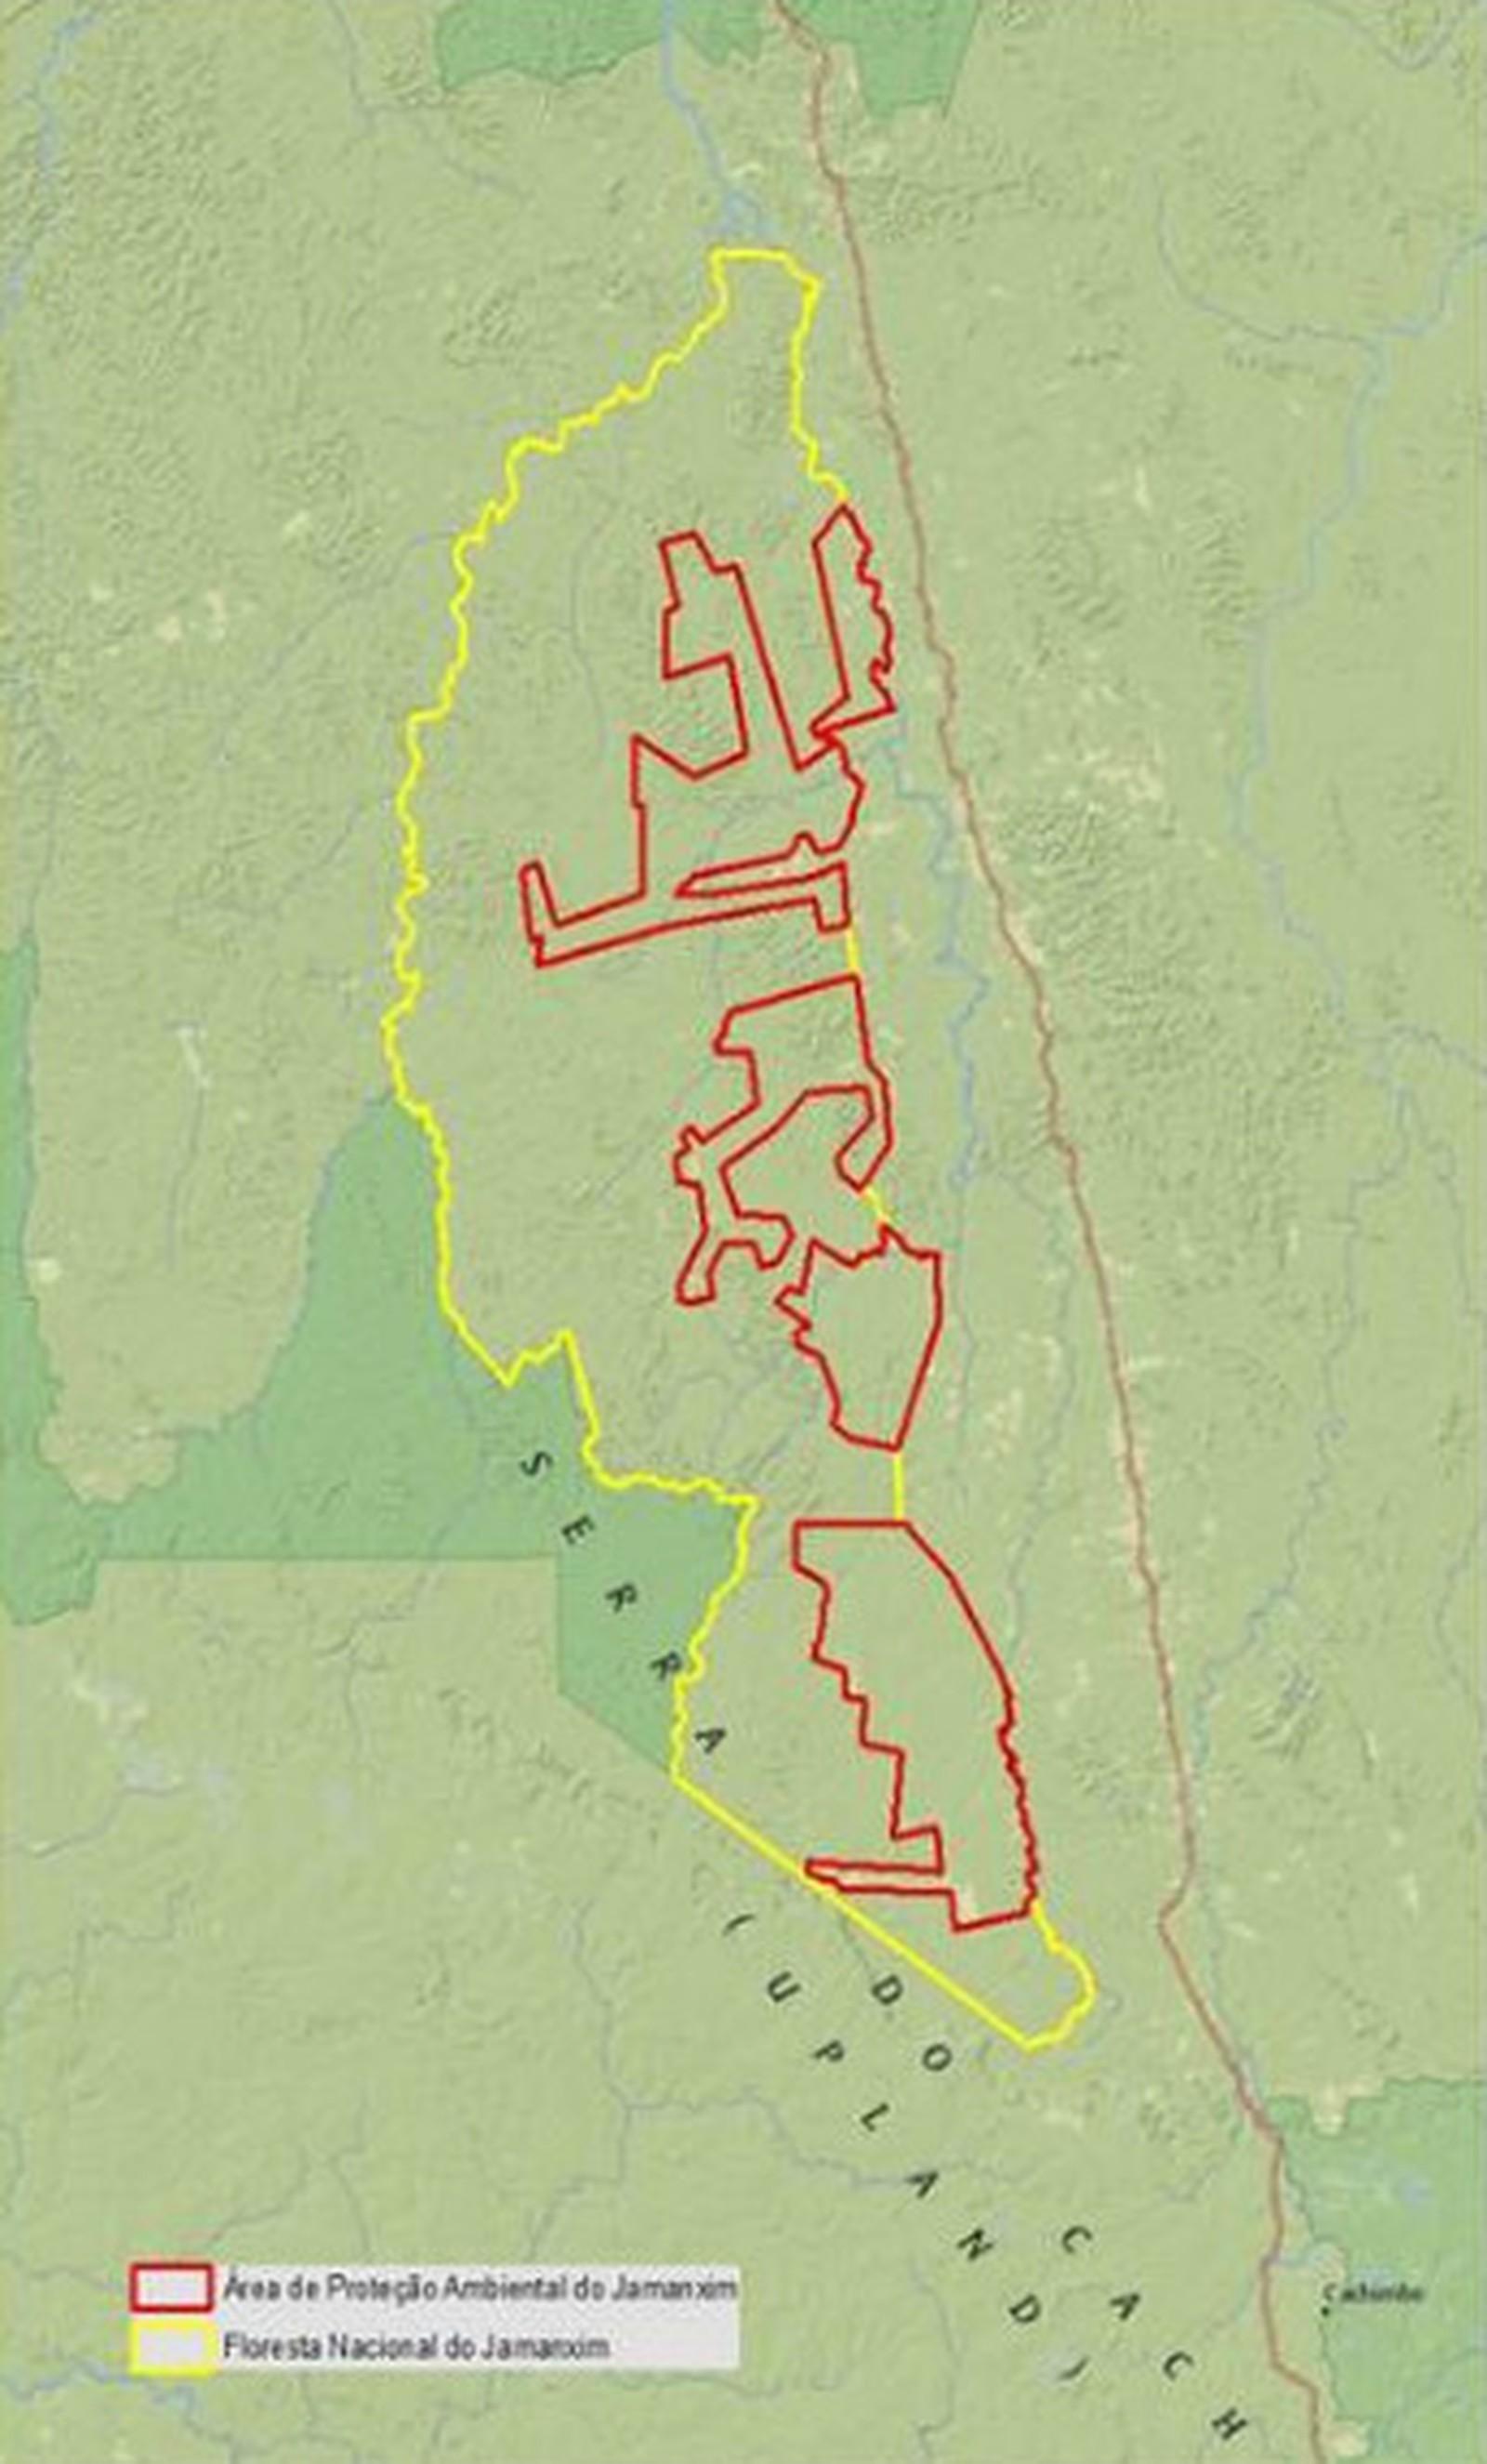 Mapa Jamanxim